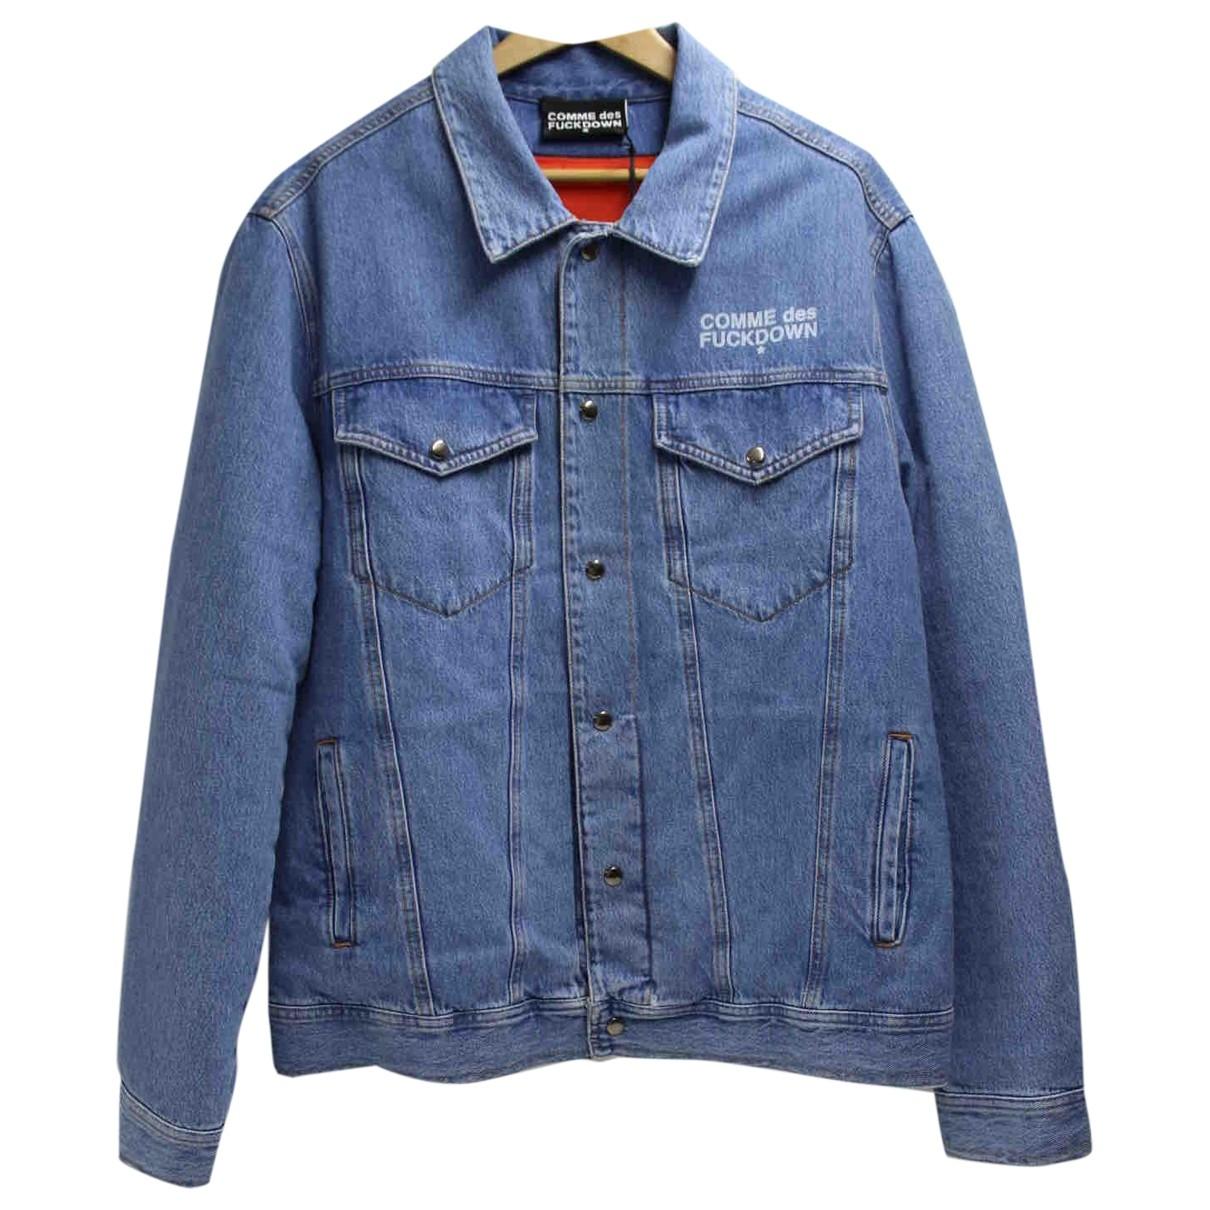 Comme Des Garcons \N Jacke in  Blau Denim - Jeans